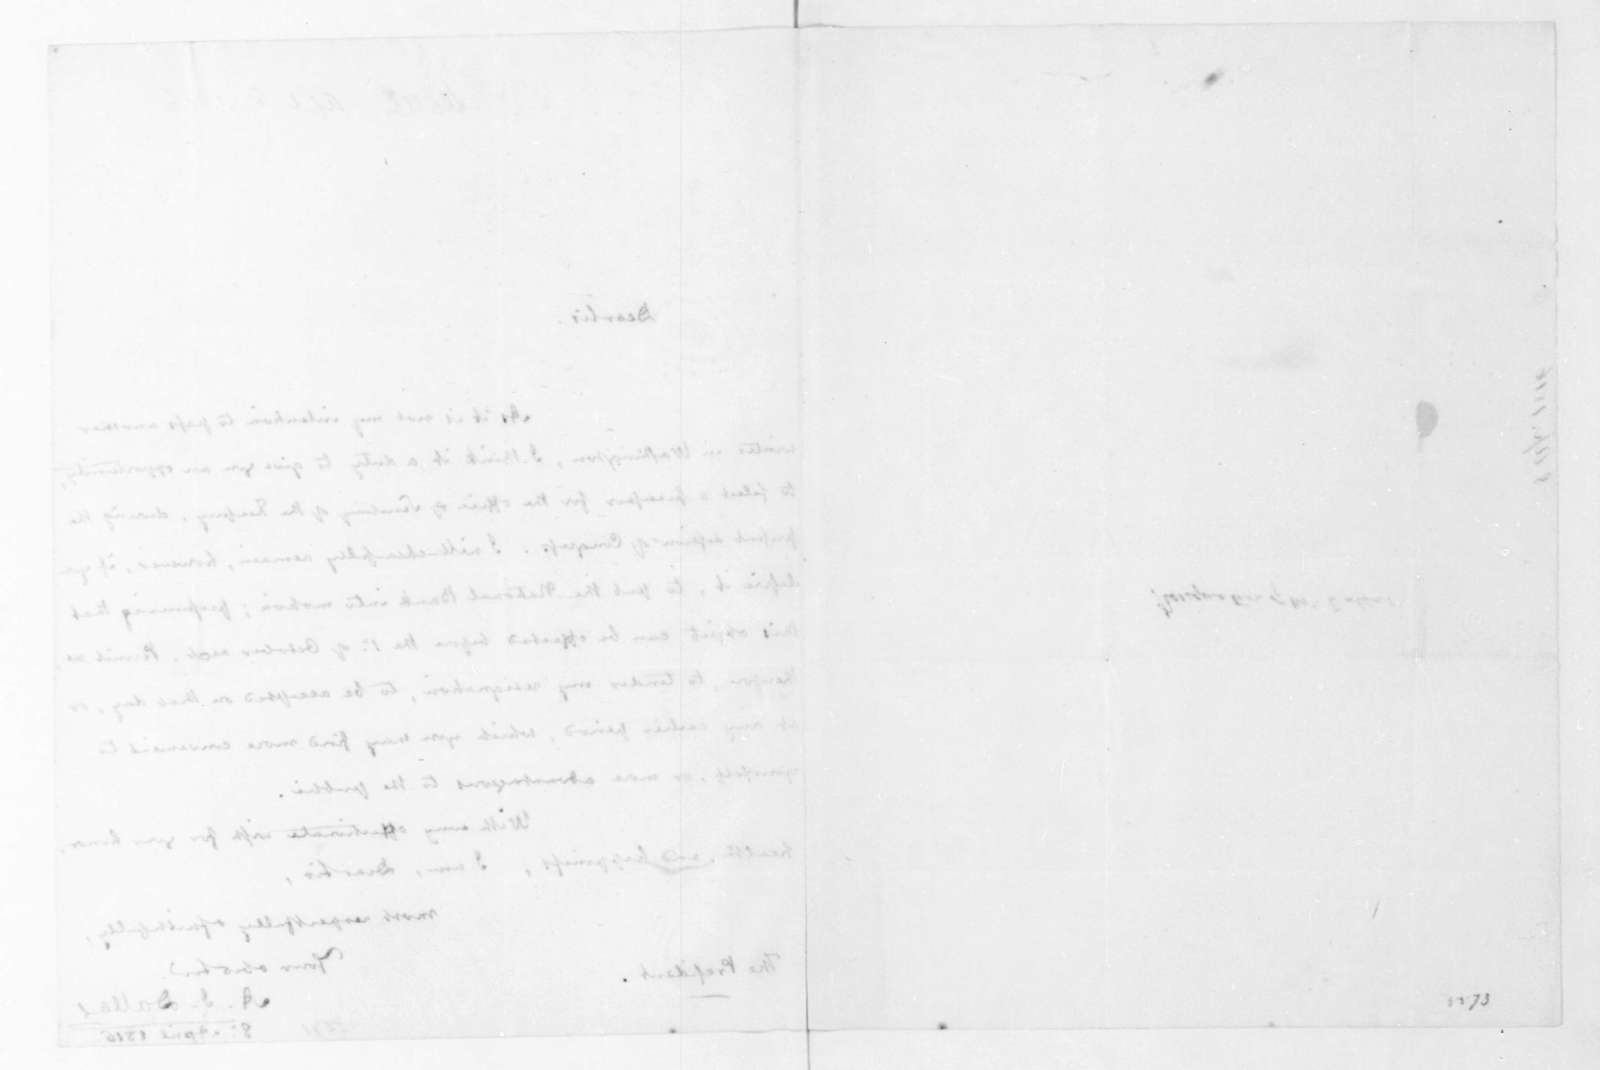 Alexander J. Dallas to James Madison, April 8, 1816.